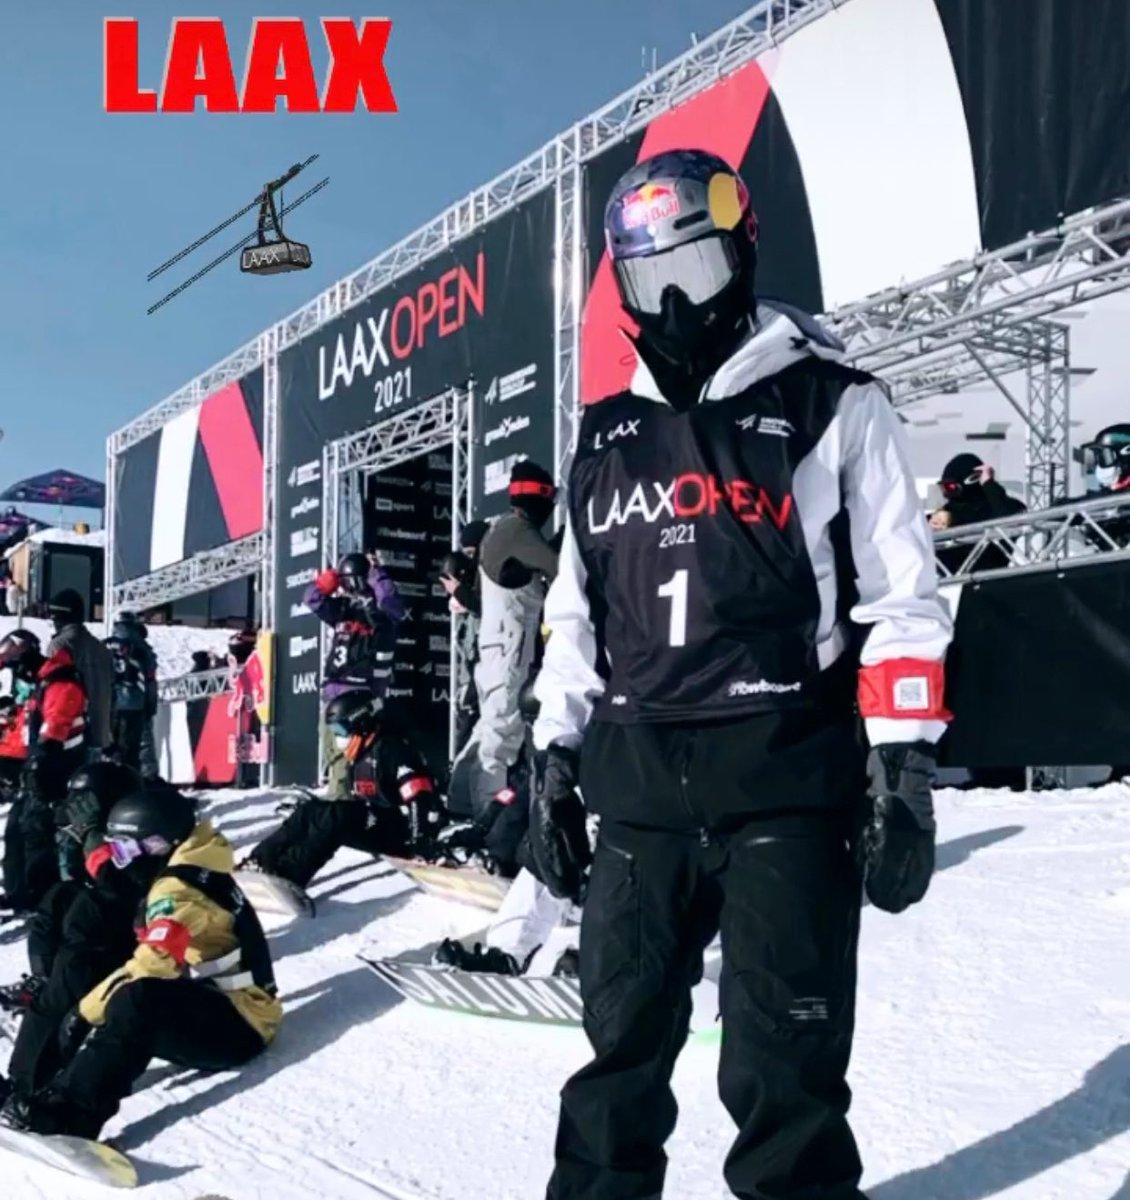 @scottyjames31 is back in the halfpipe this week in the Laax Open @fissnowboard World Cup. Bring the fire 🔥 SJ! 🥊🥊 #snowboard #worldcup #laaxopen #halfpipe #teamaus #scottyjames 🇦🇺 https://t.co/PyY3vLrRjM